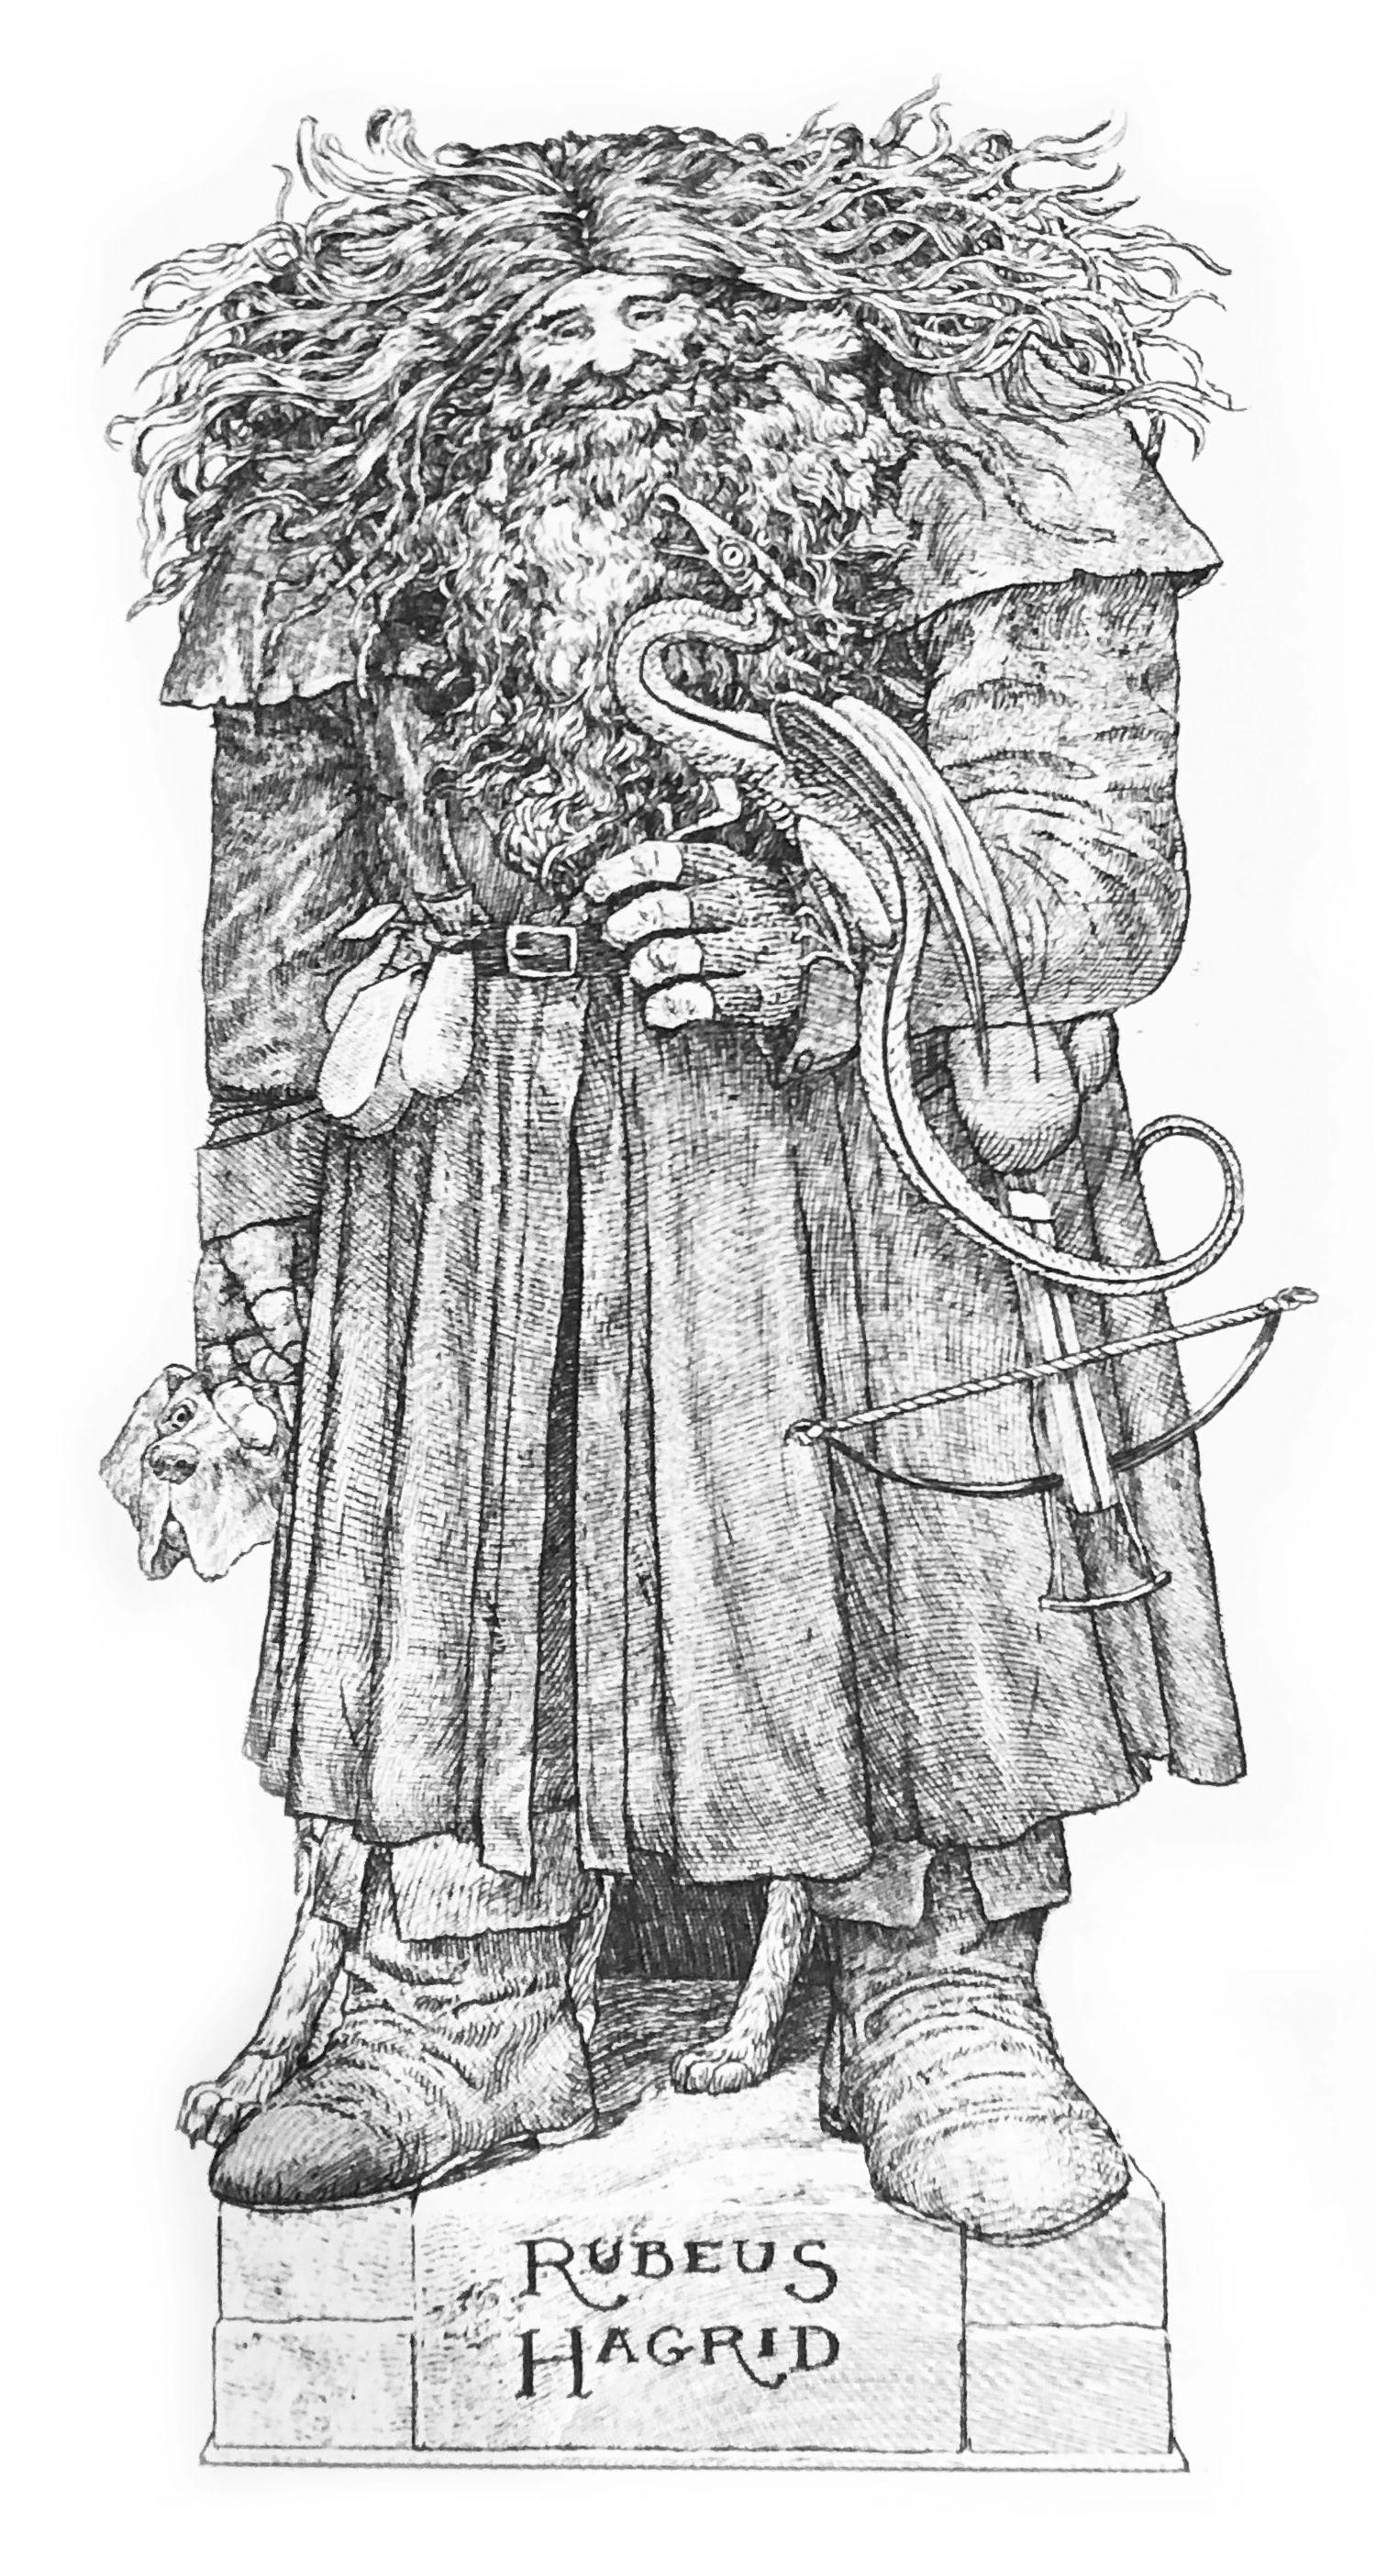 Rubeus Hagrid illustration (house editions)